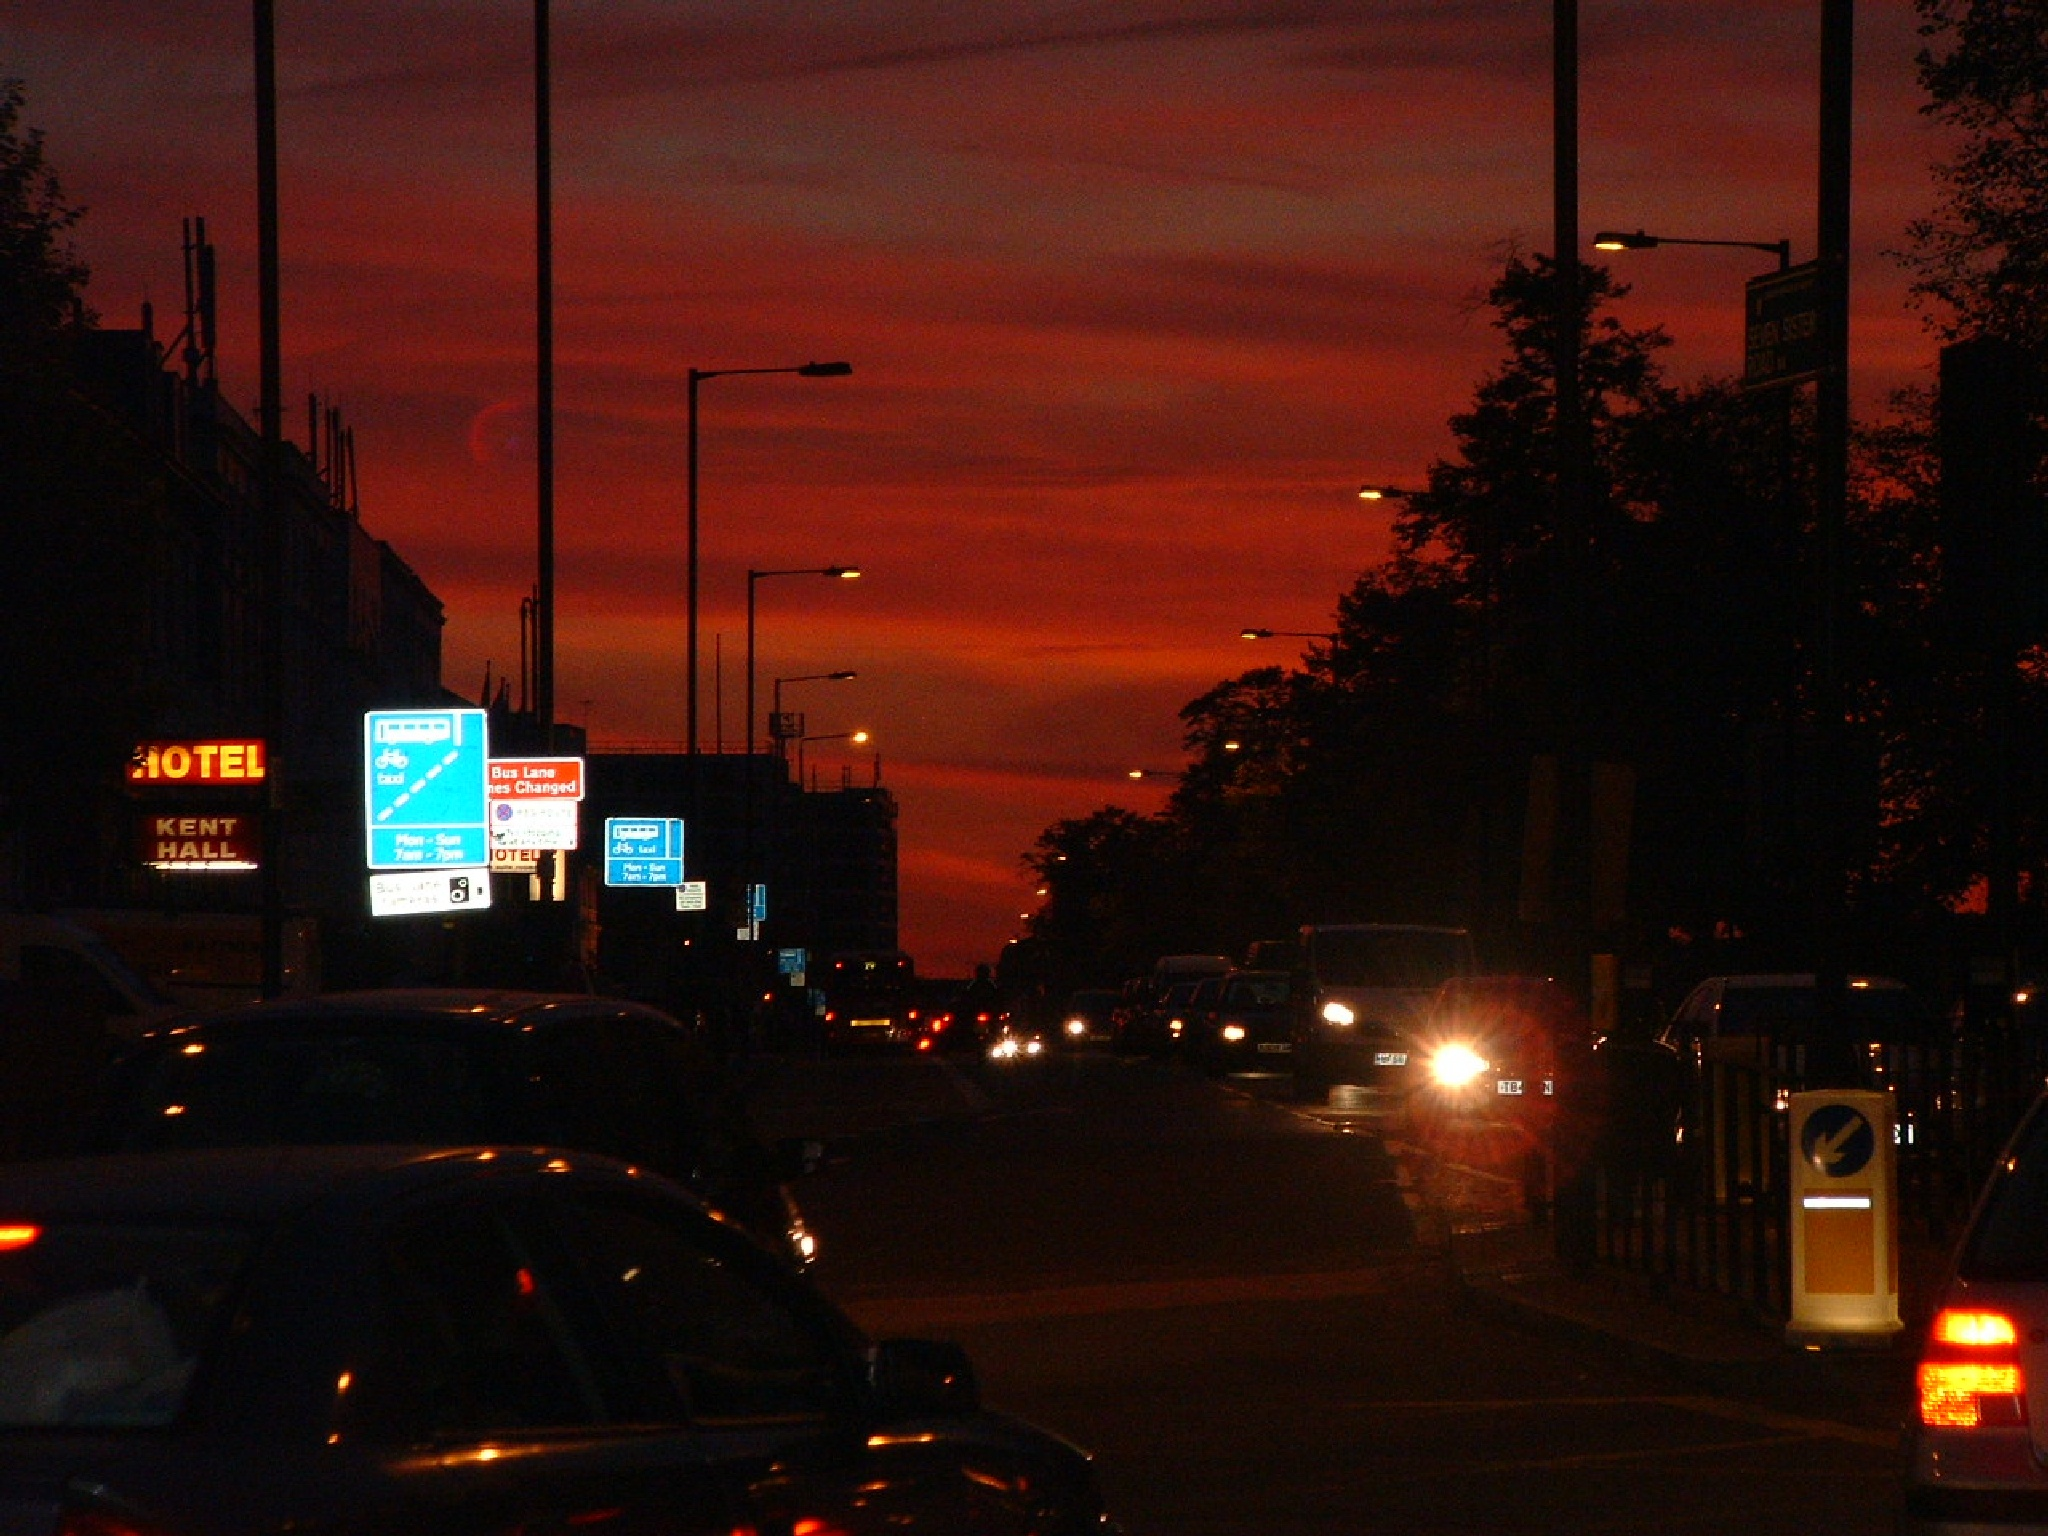 Lights vs darkness -Manor House station - North London by Sima Janan